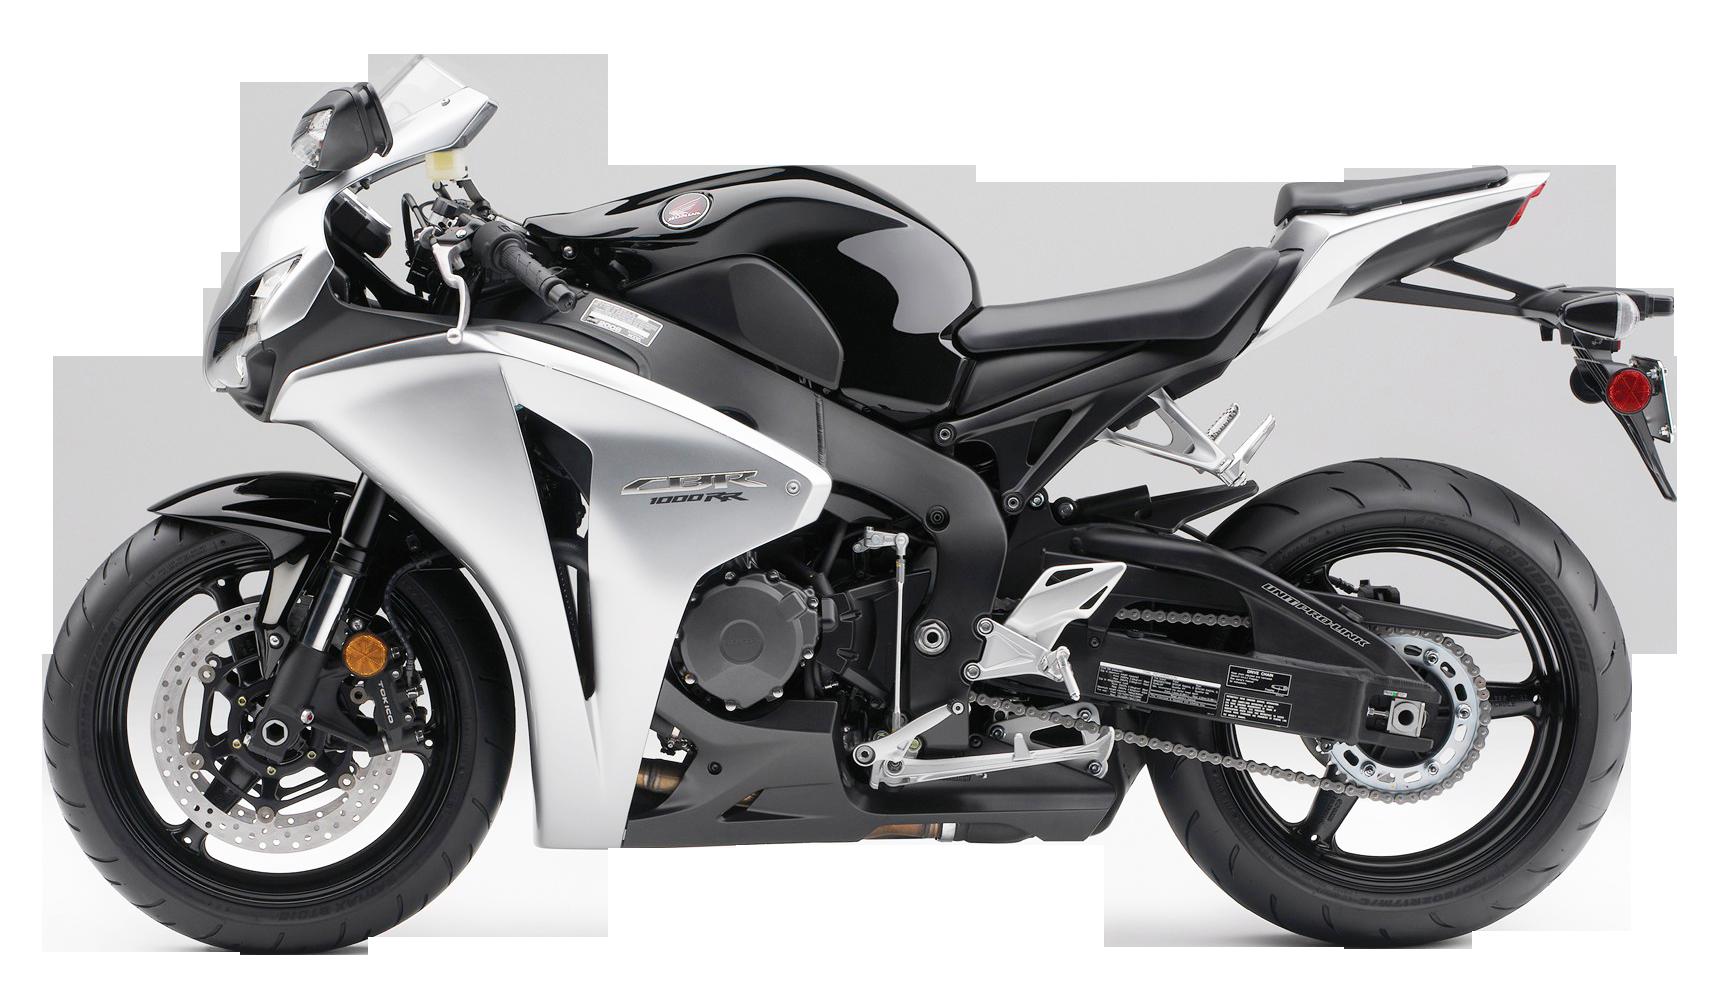 Honda CBR1000RR PNG Image